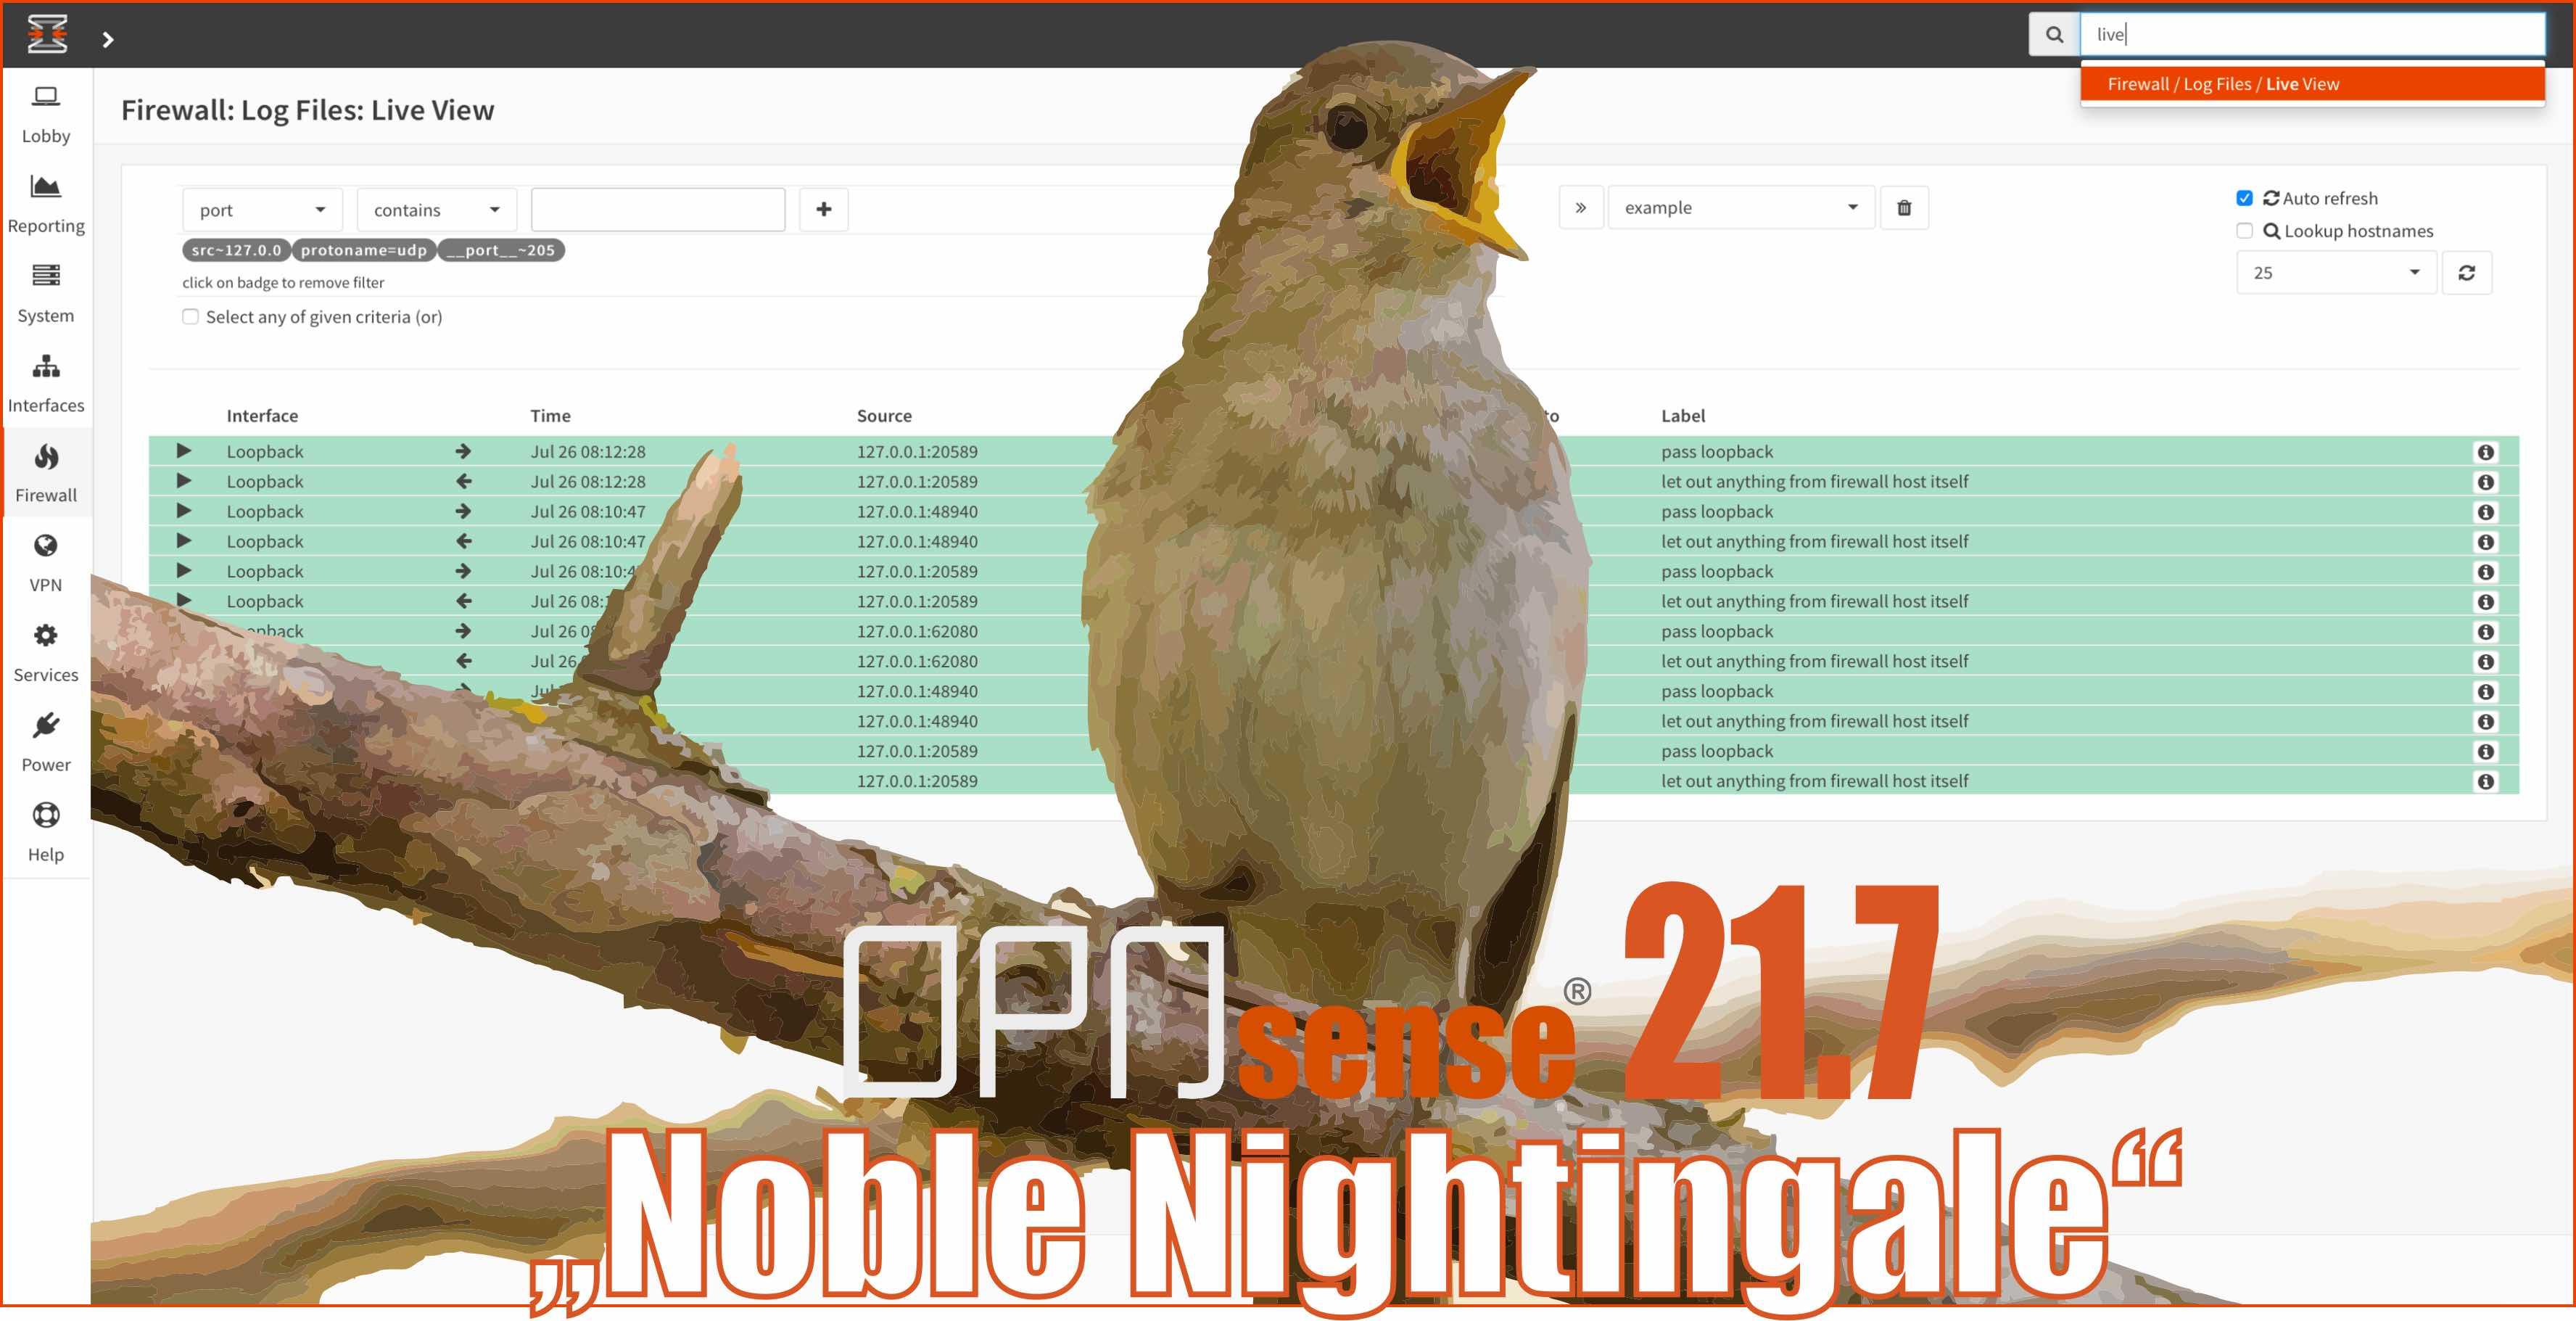 Press Photo OPNsense 21.7 Noble Nightingale